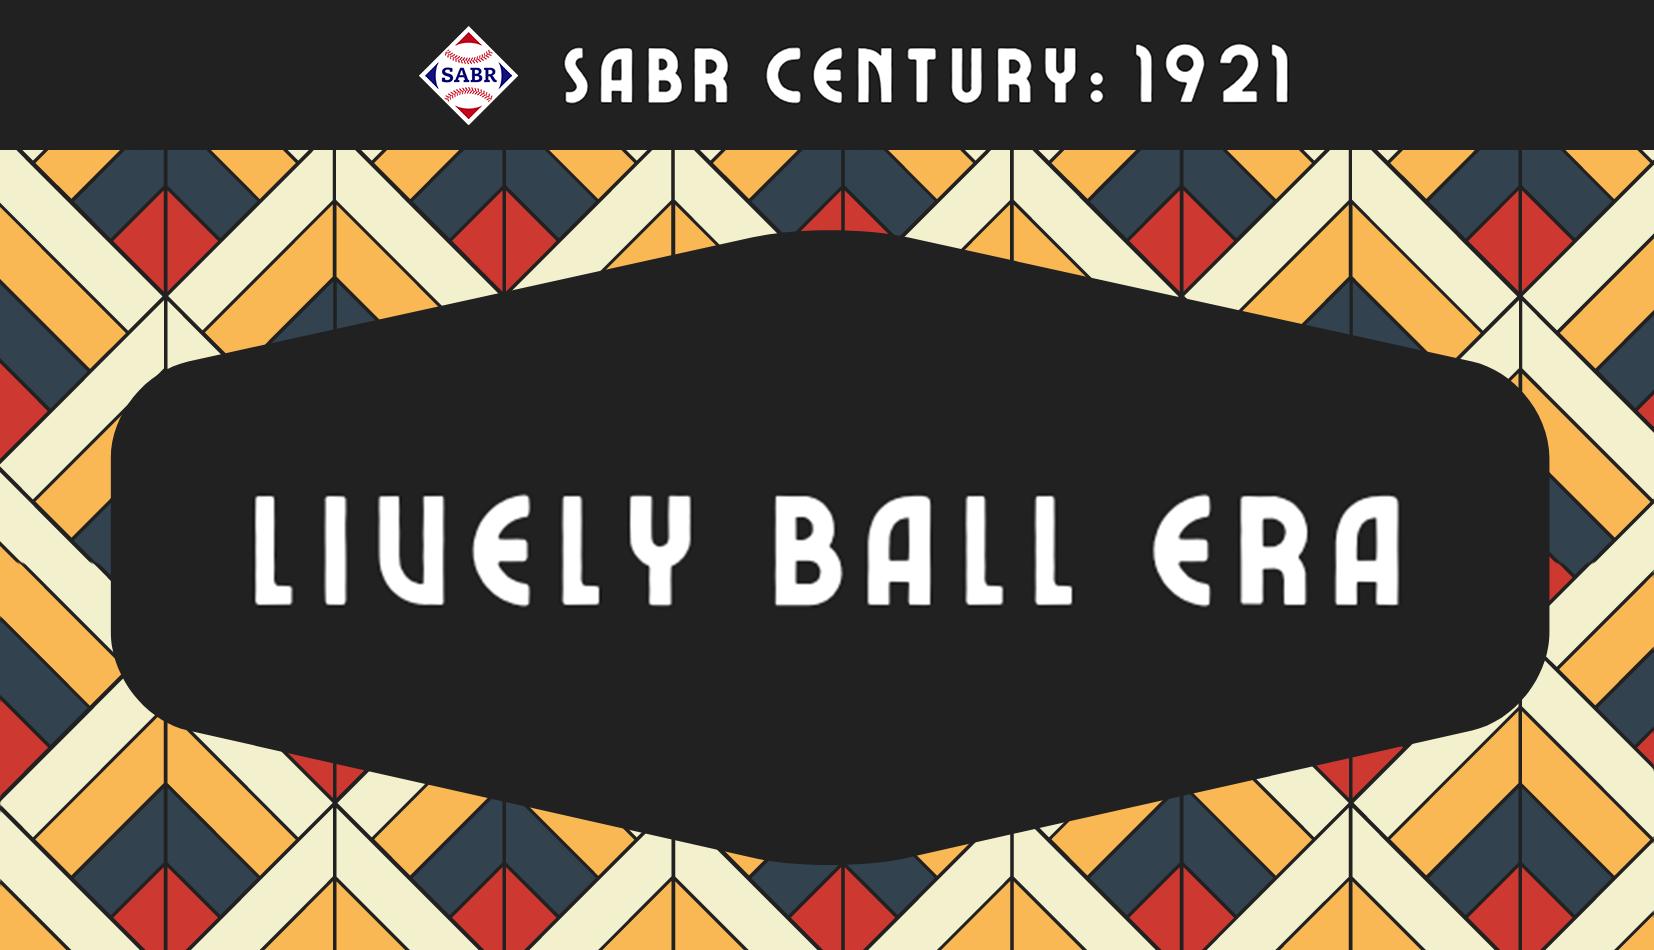 SABR Century 1921: Lively Ball Era